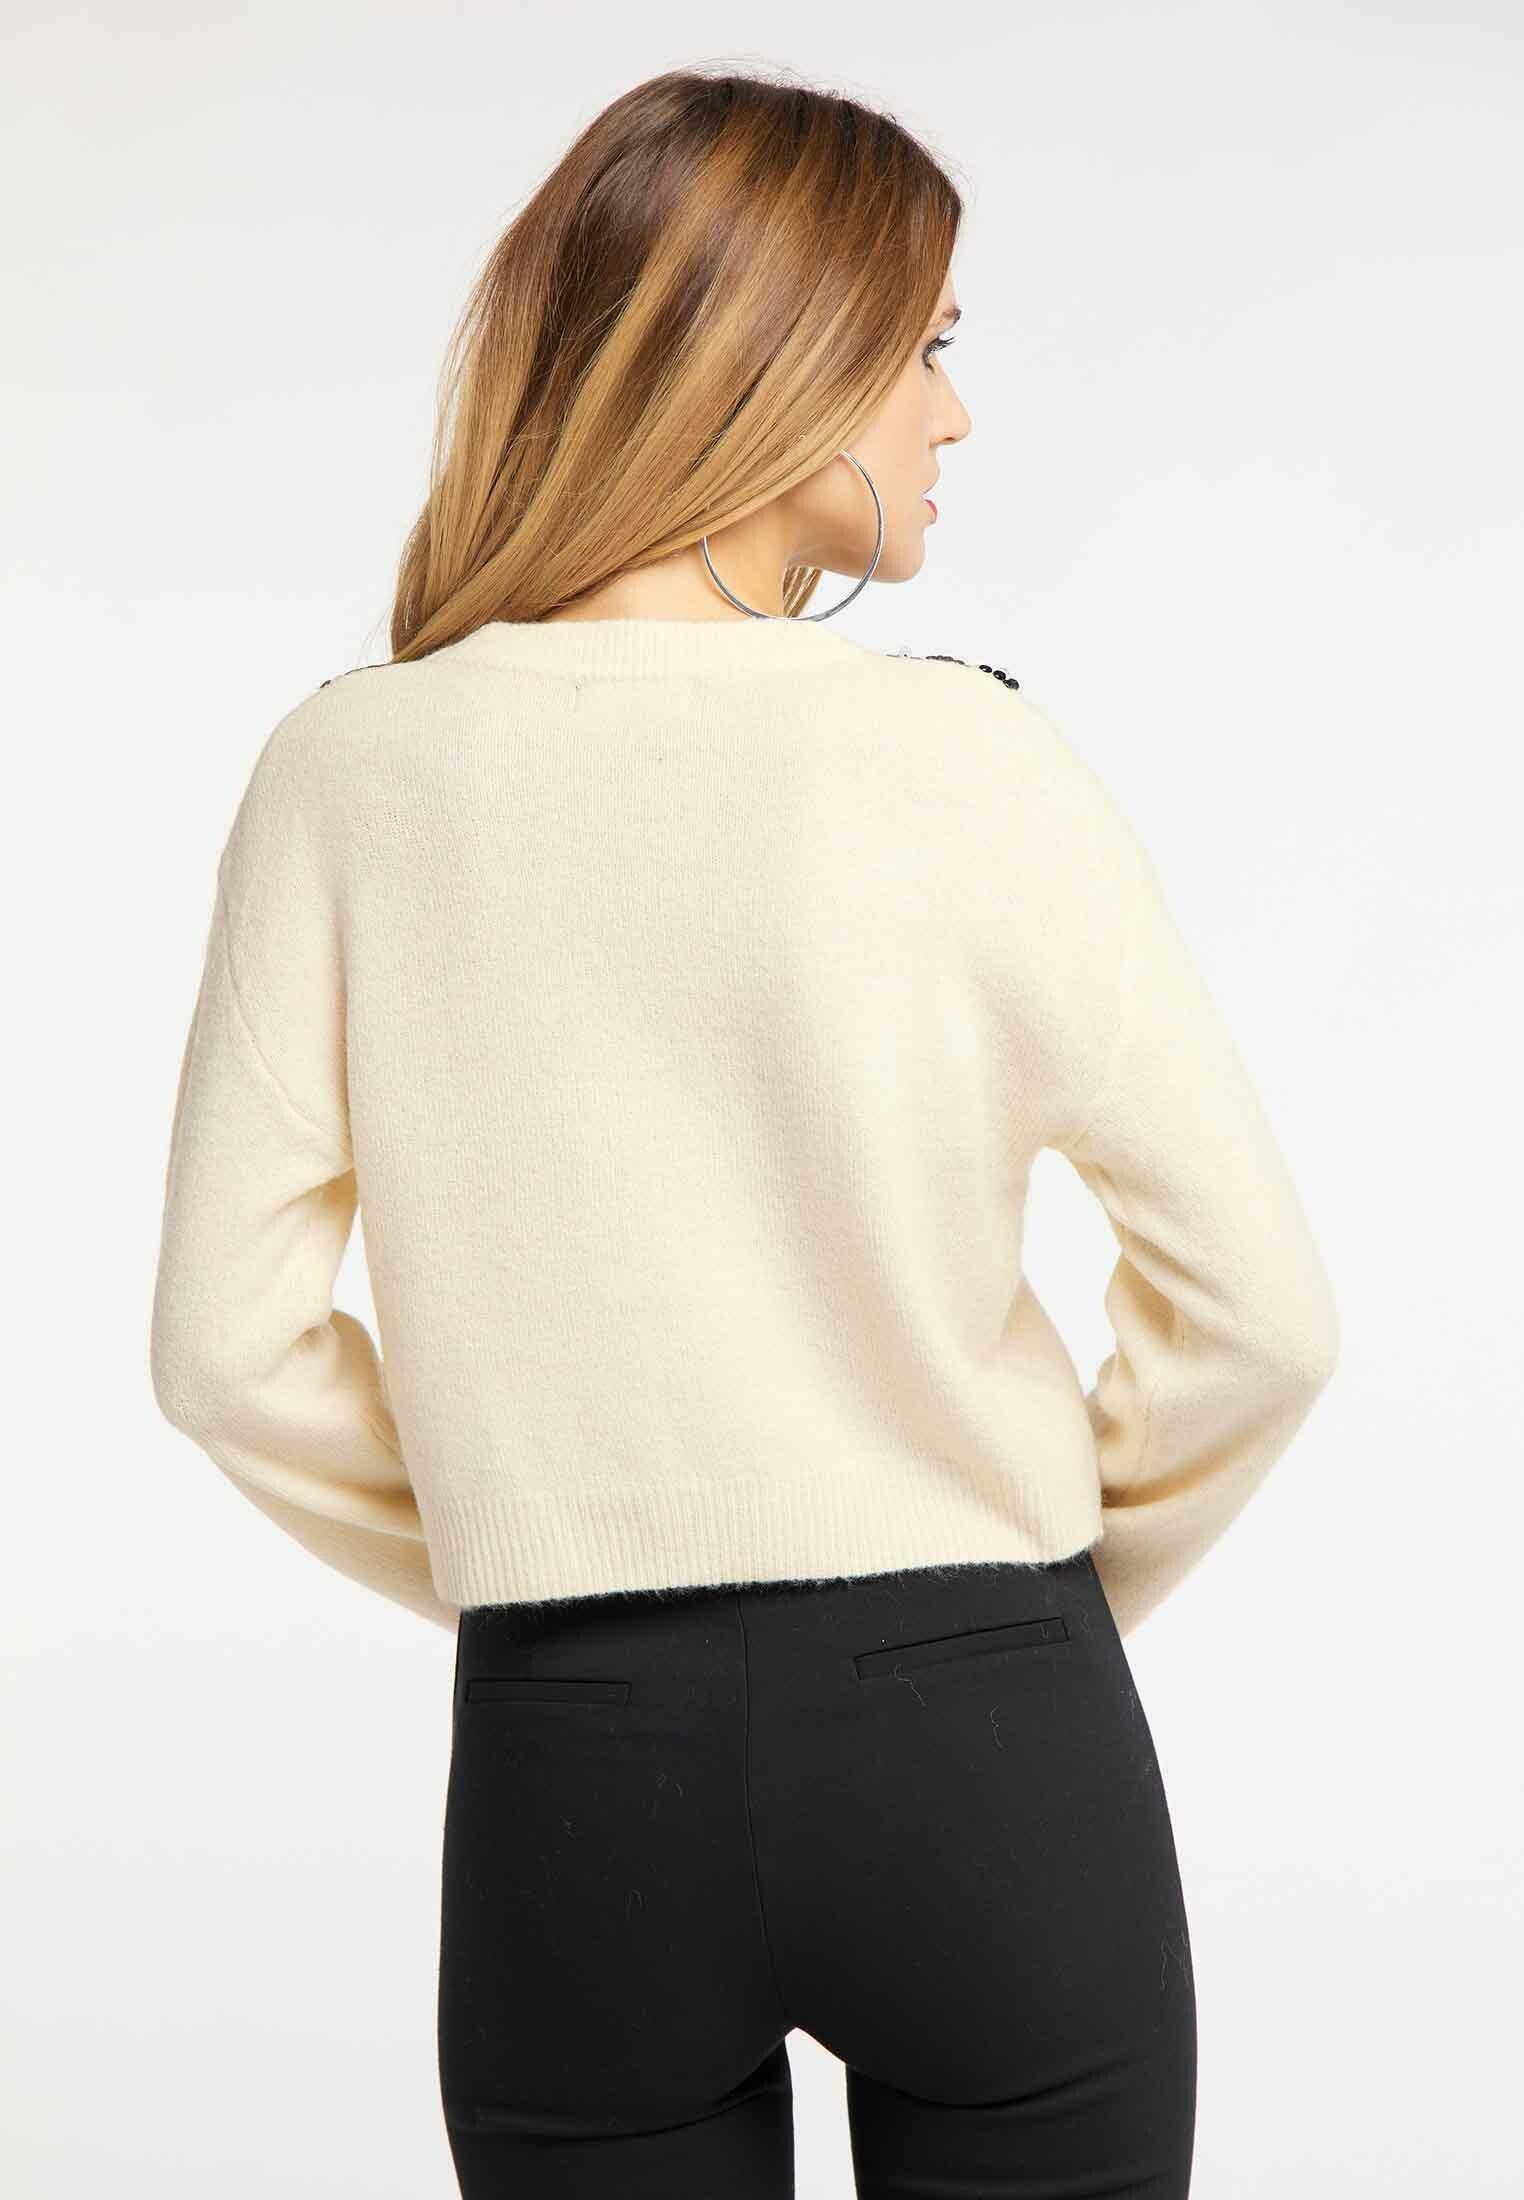 Super Specials Women's Clothing faina Jumper light beige oDQf4XDOy